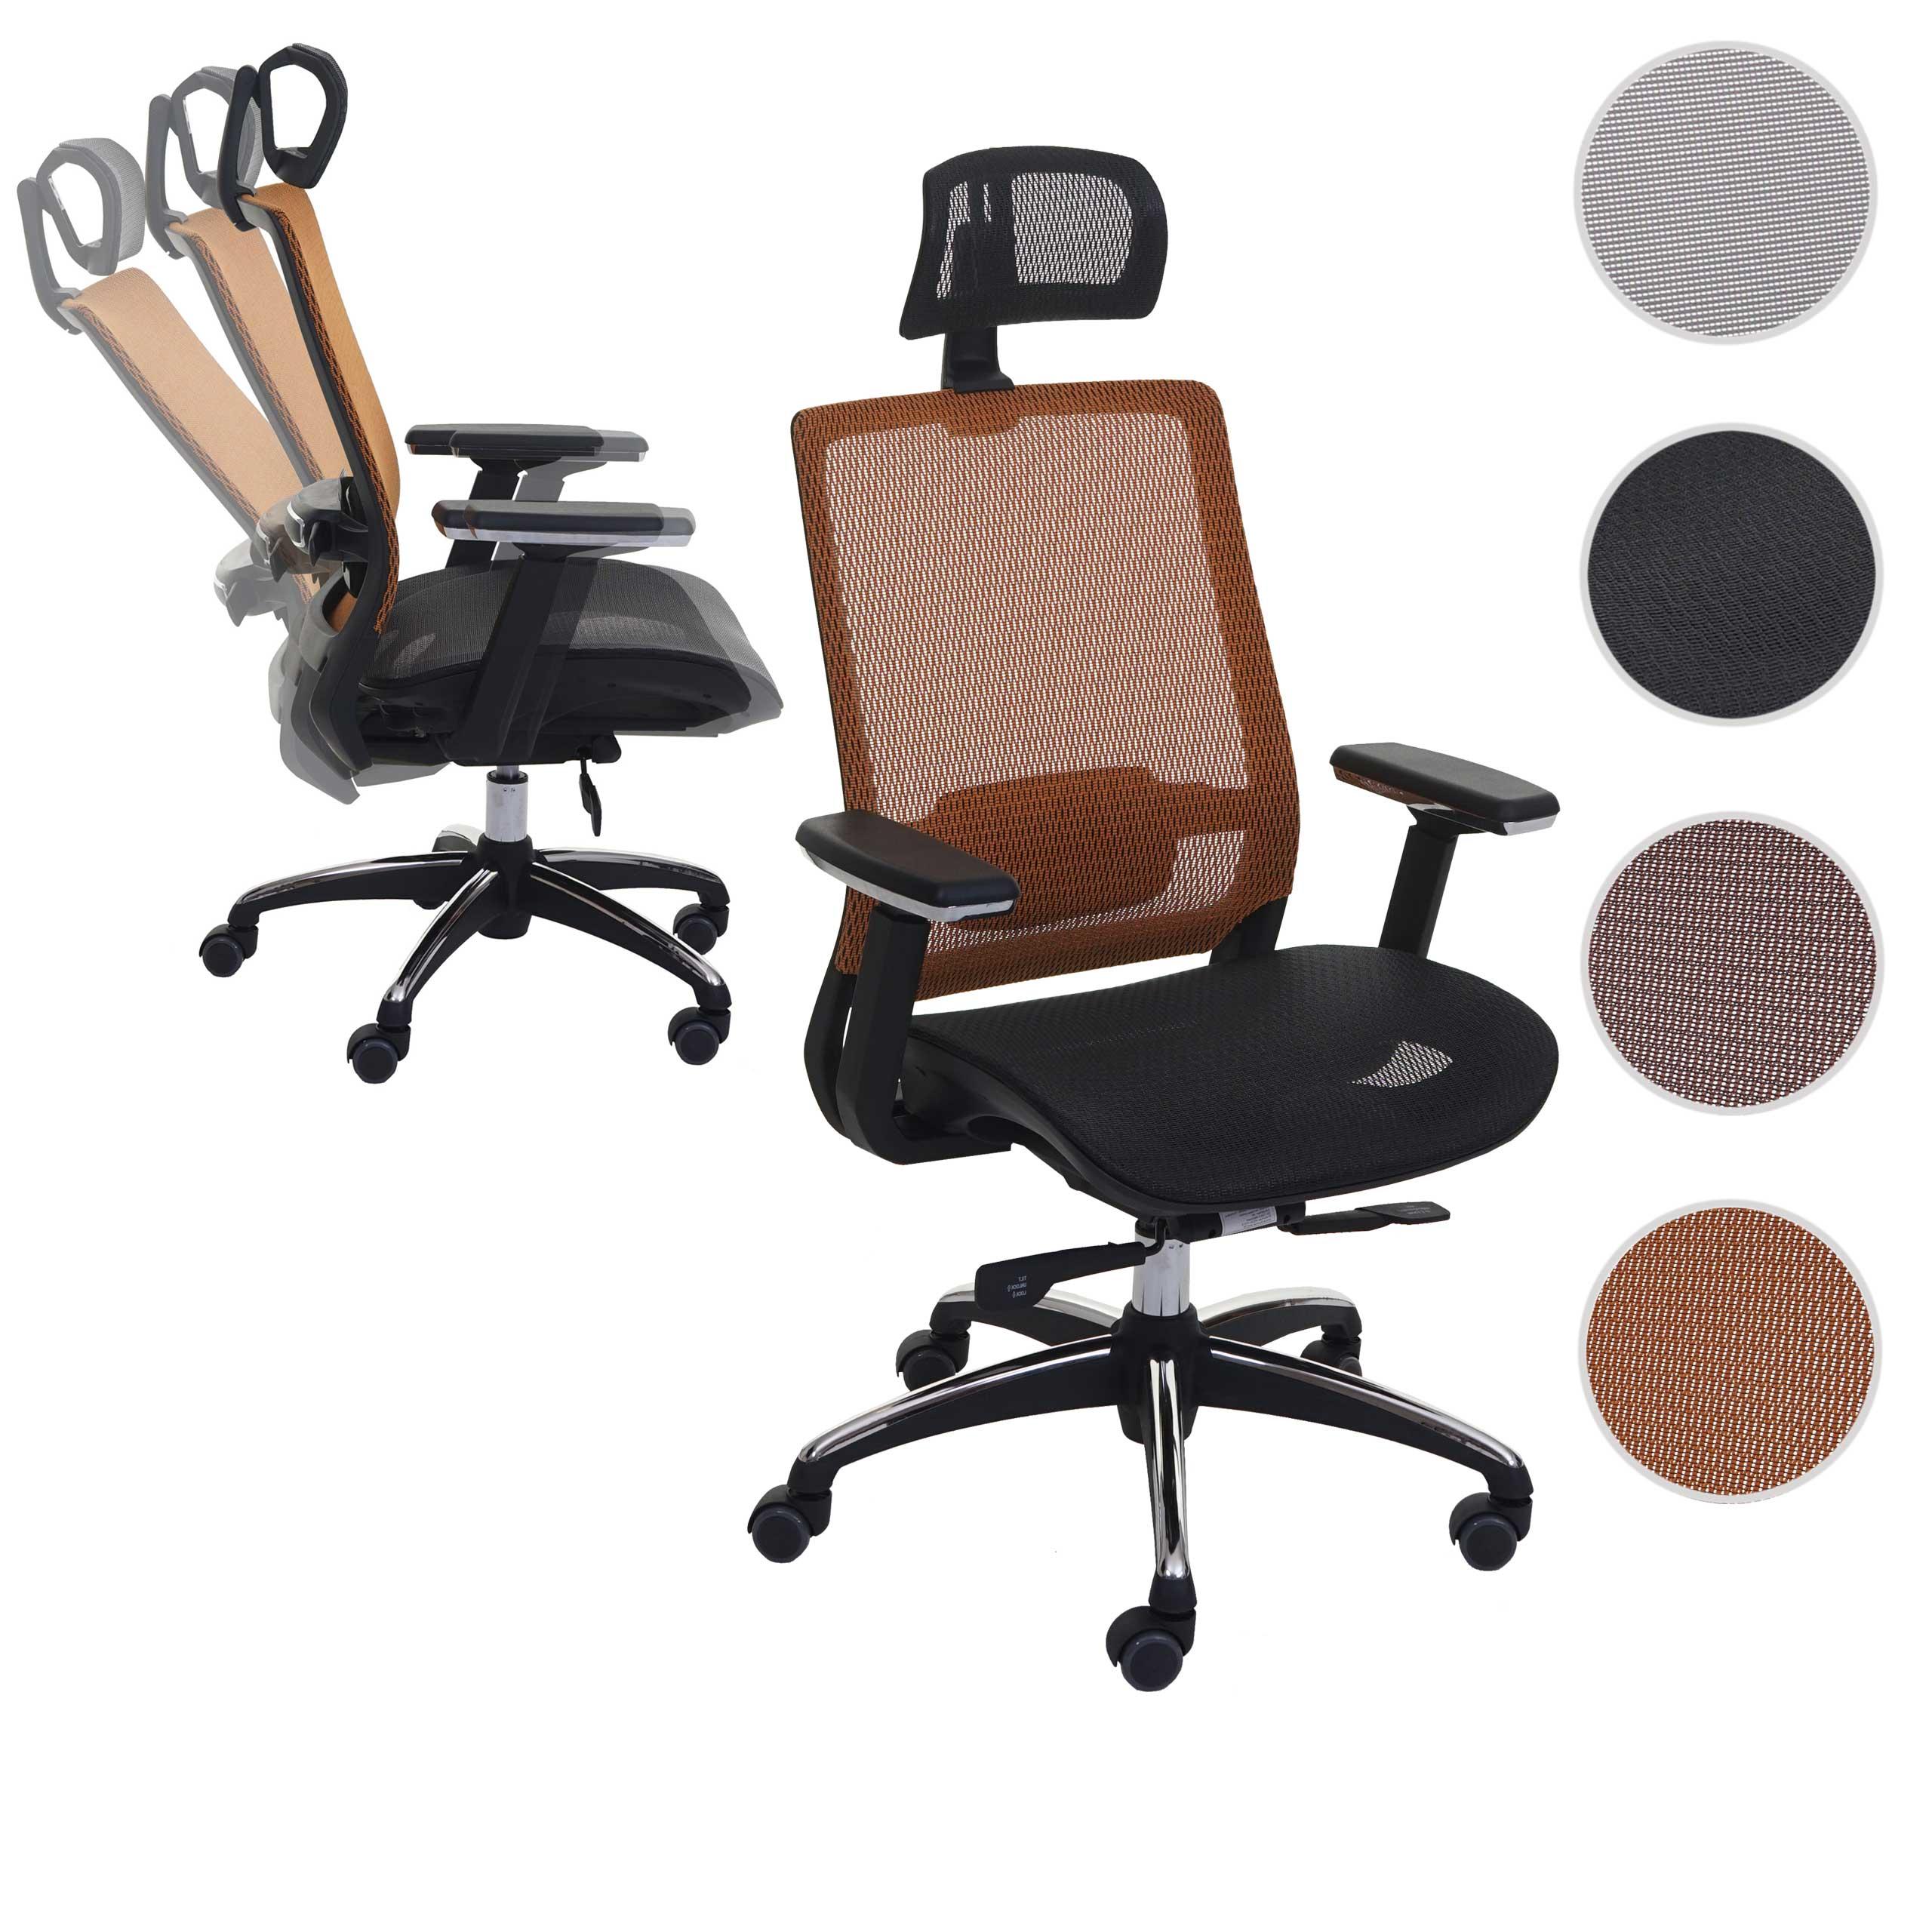 Bürostuhl HWC A20, Schreibtischstuhl, ergonomisch Kopfstütze StoffTextil ISO9001